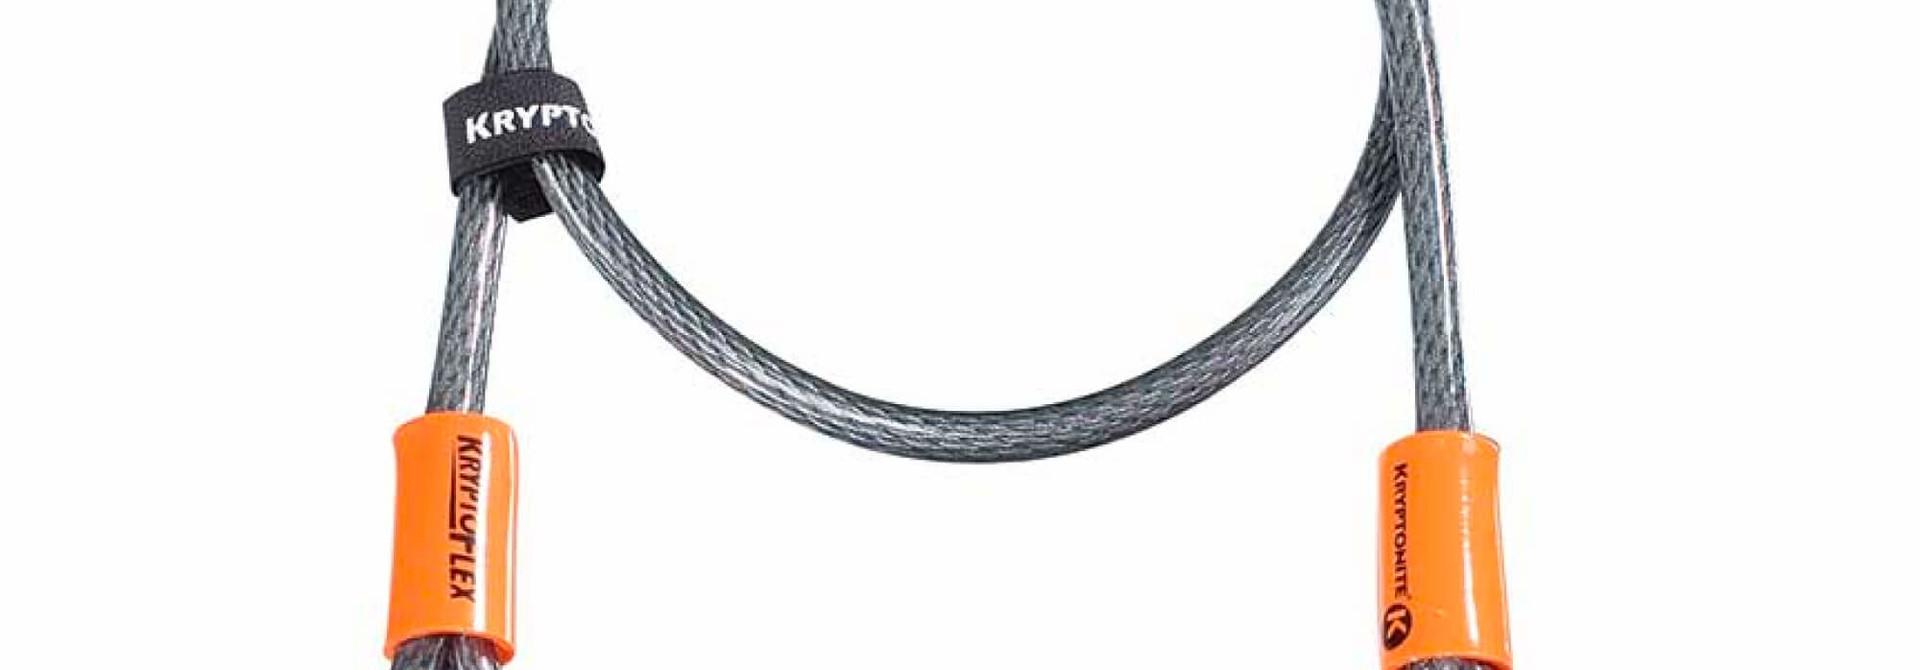 Kryptoflex 1004 Looped Cable 120cm X 10mm